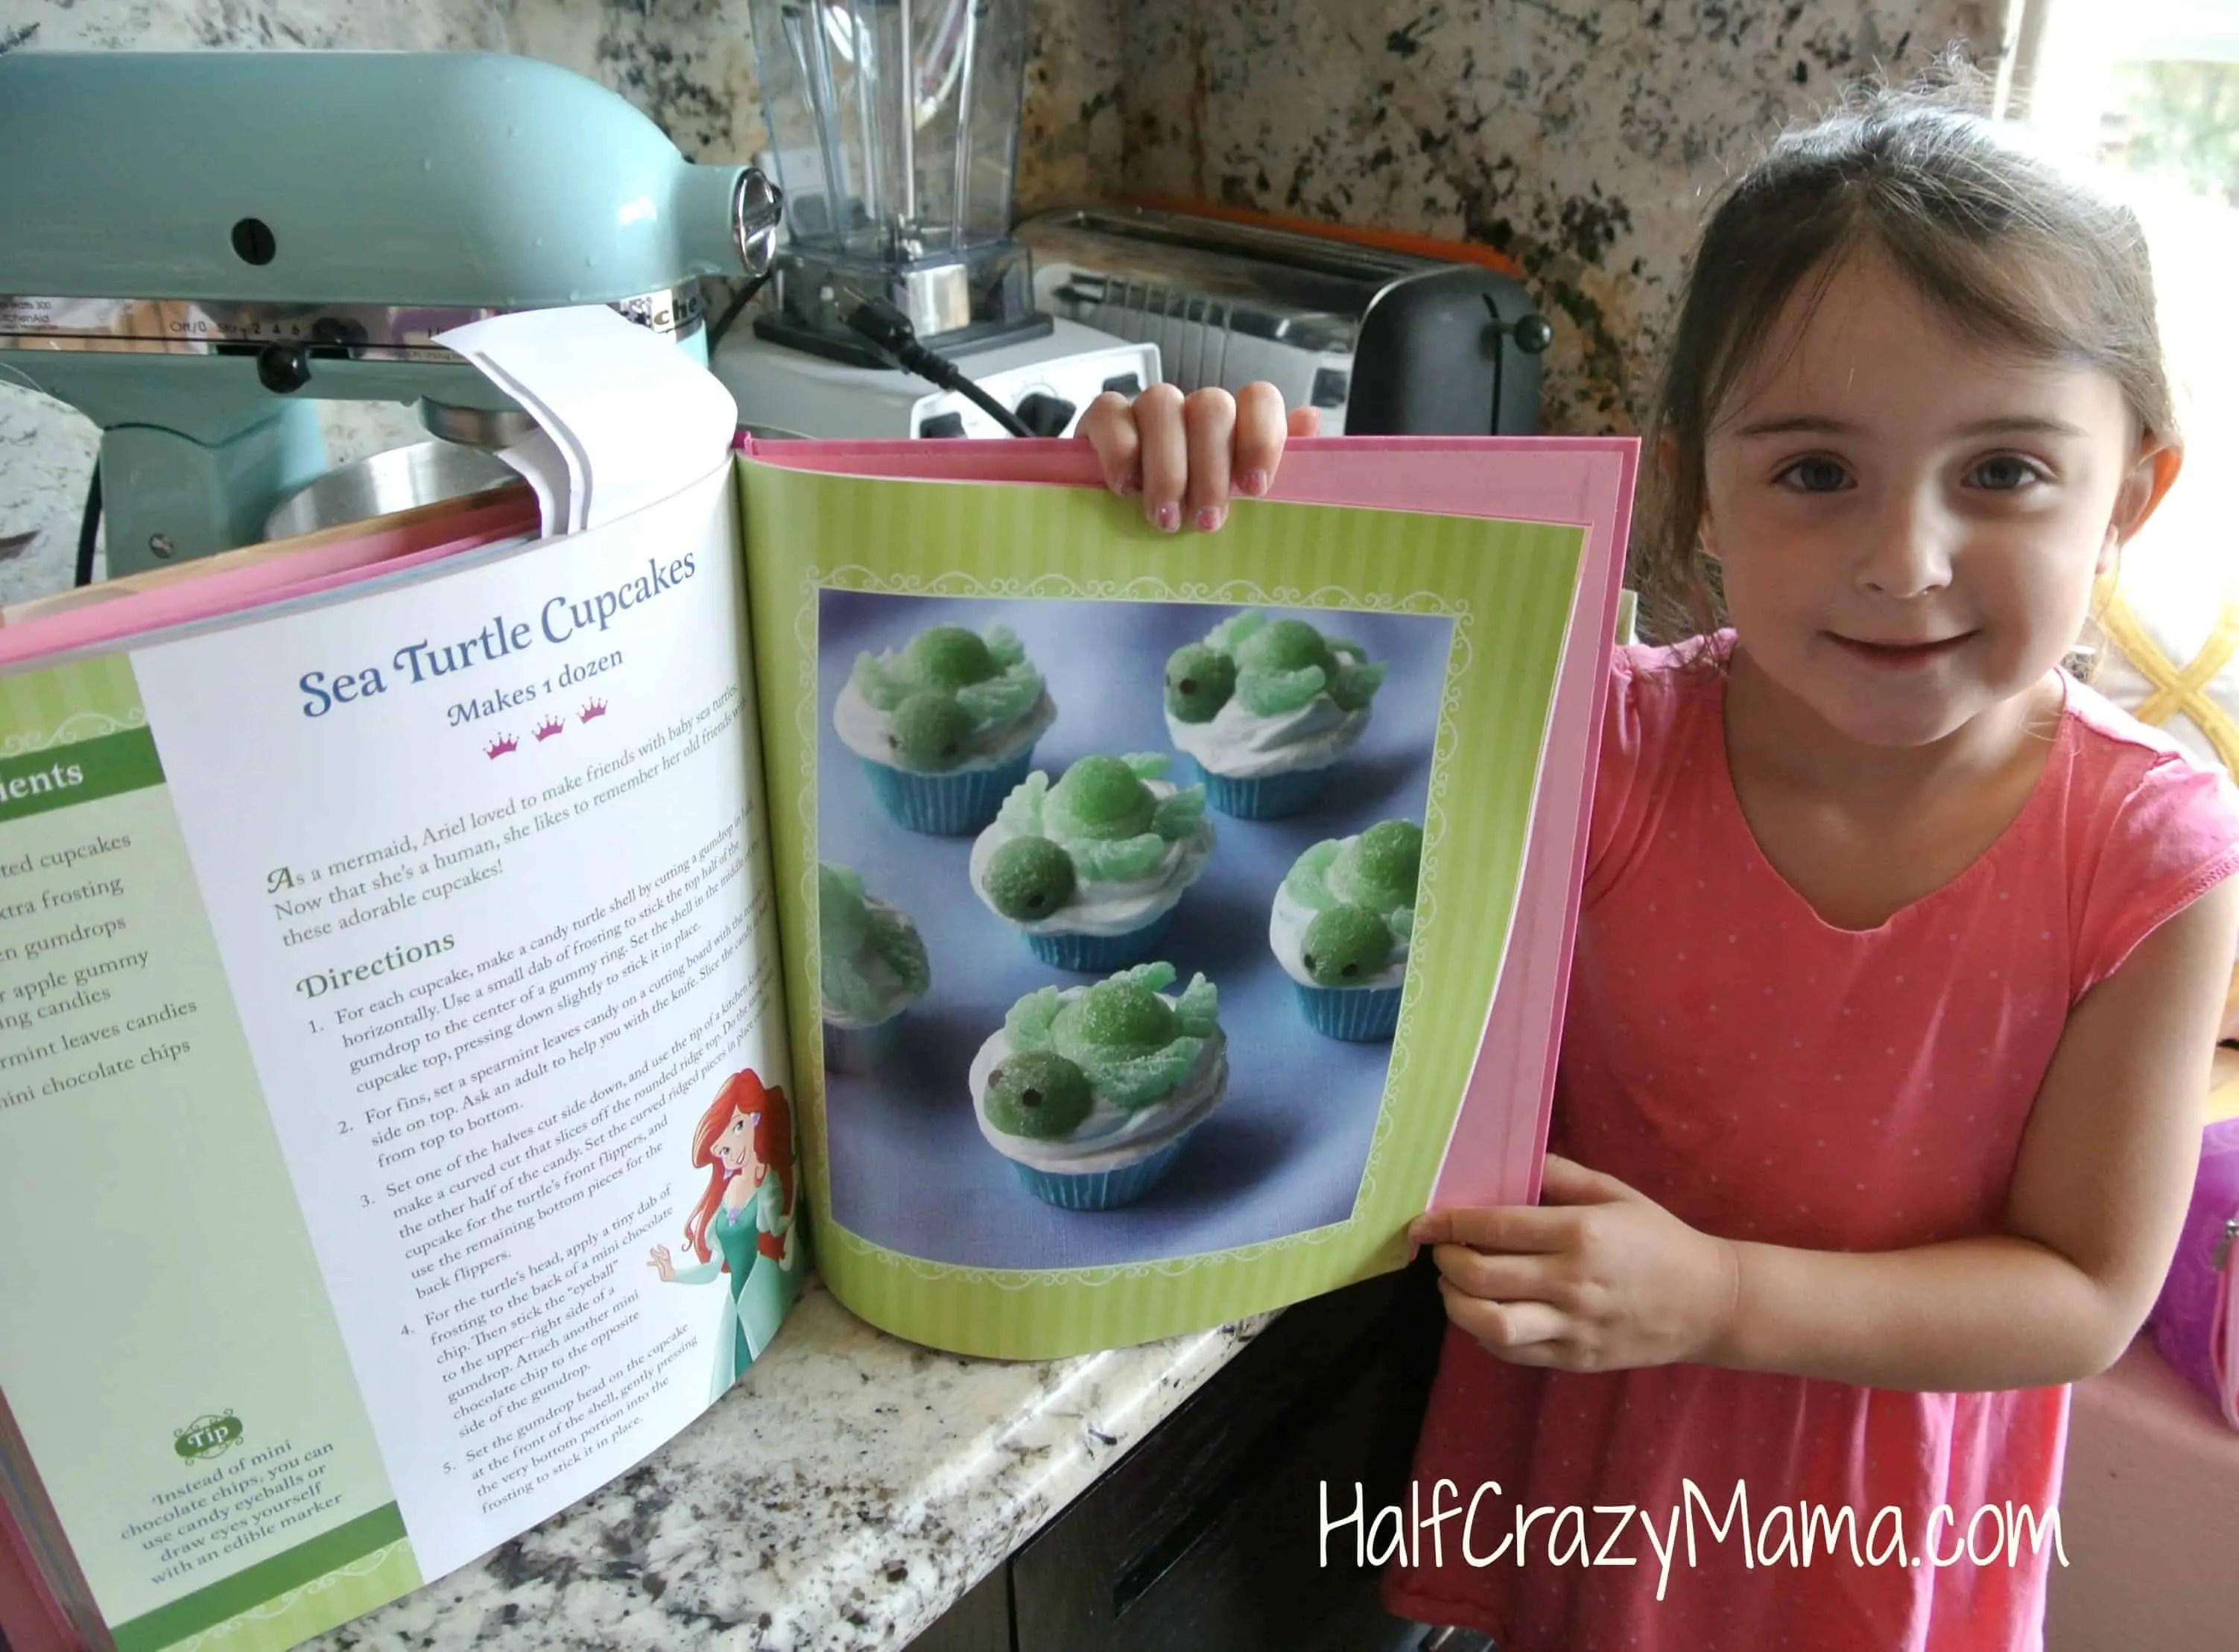 turtle cupcakes cookbook